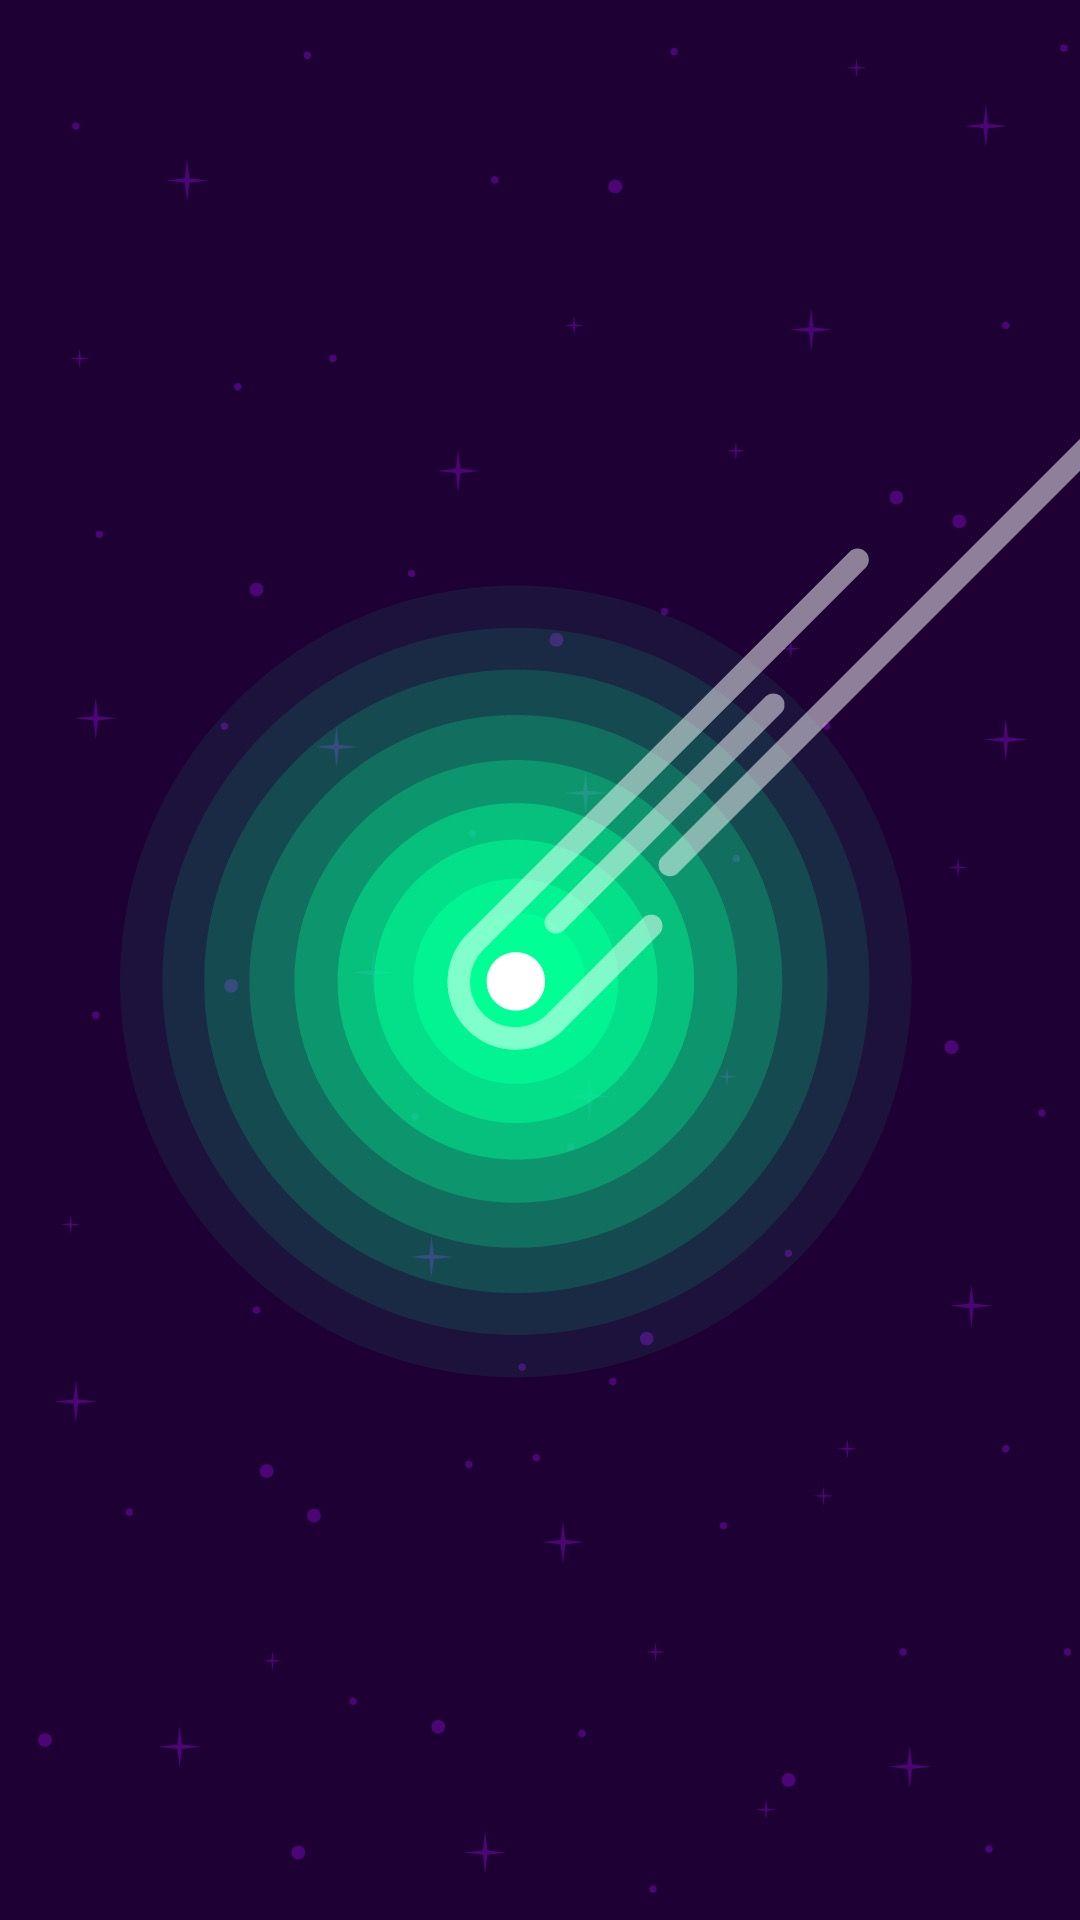 Kurzgesagt Wallpaper In 2019 Planets Wallpaper Minimal